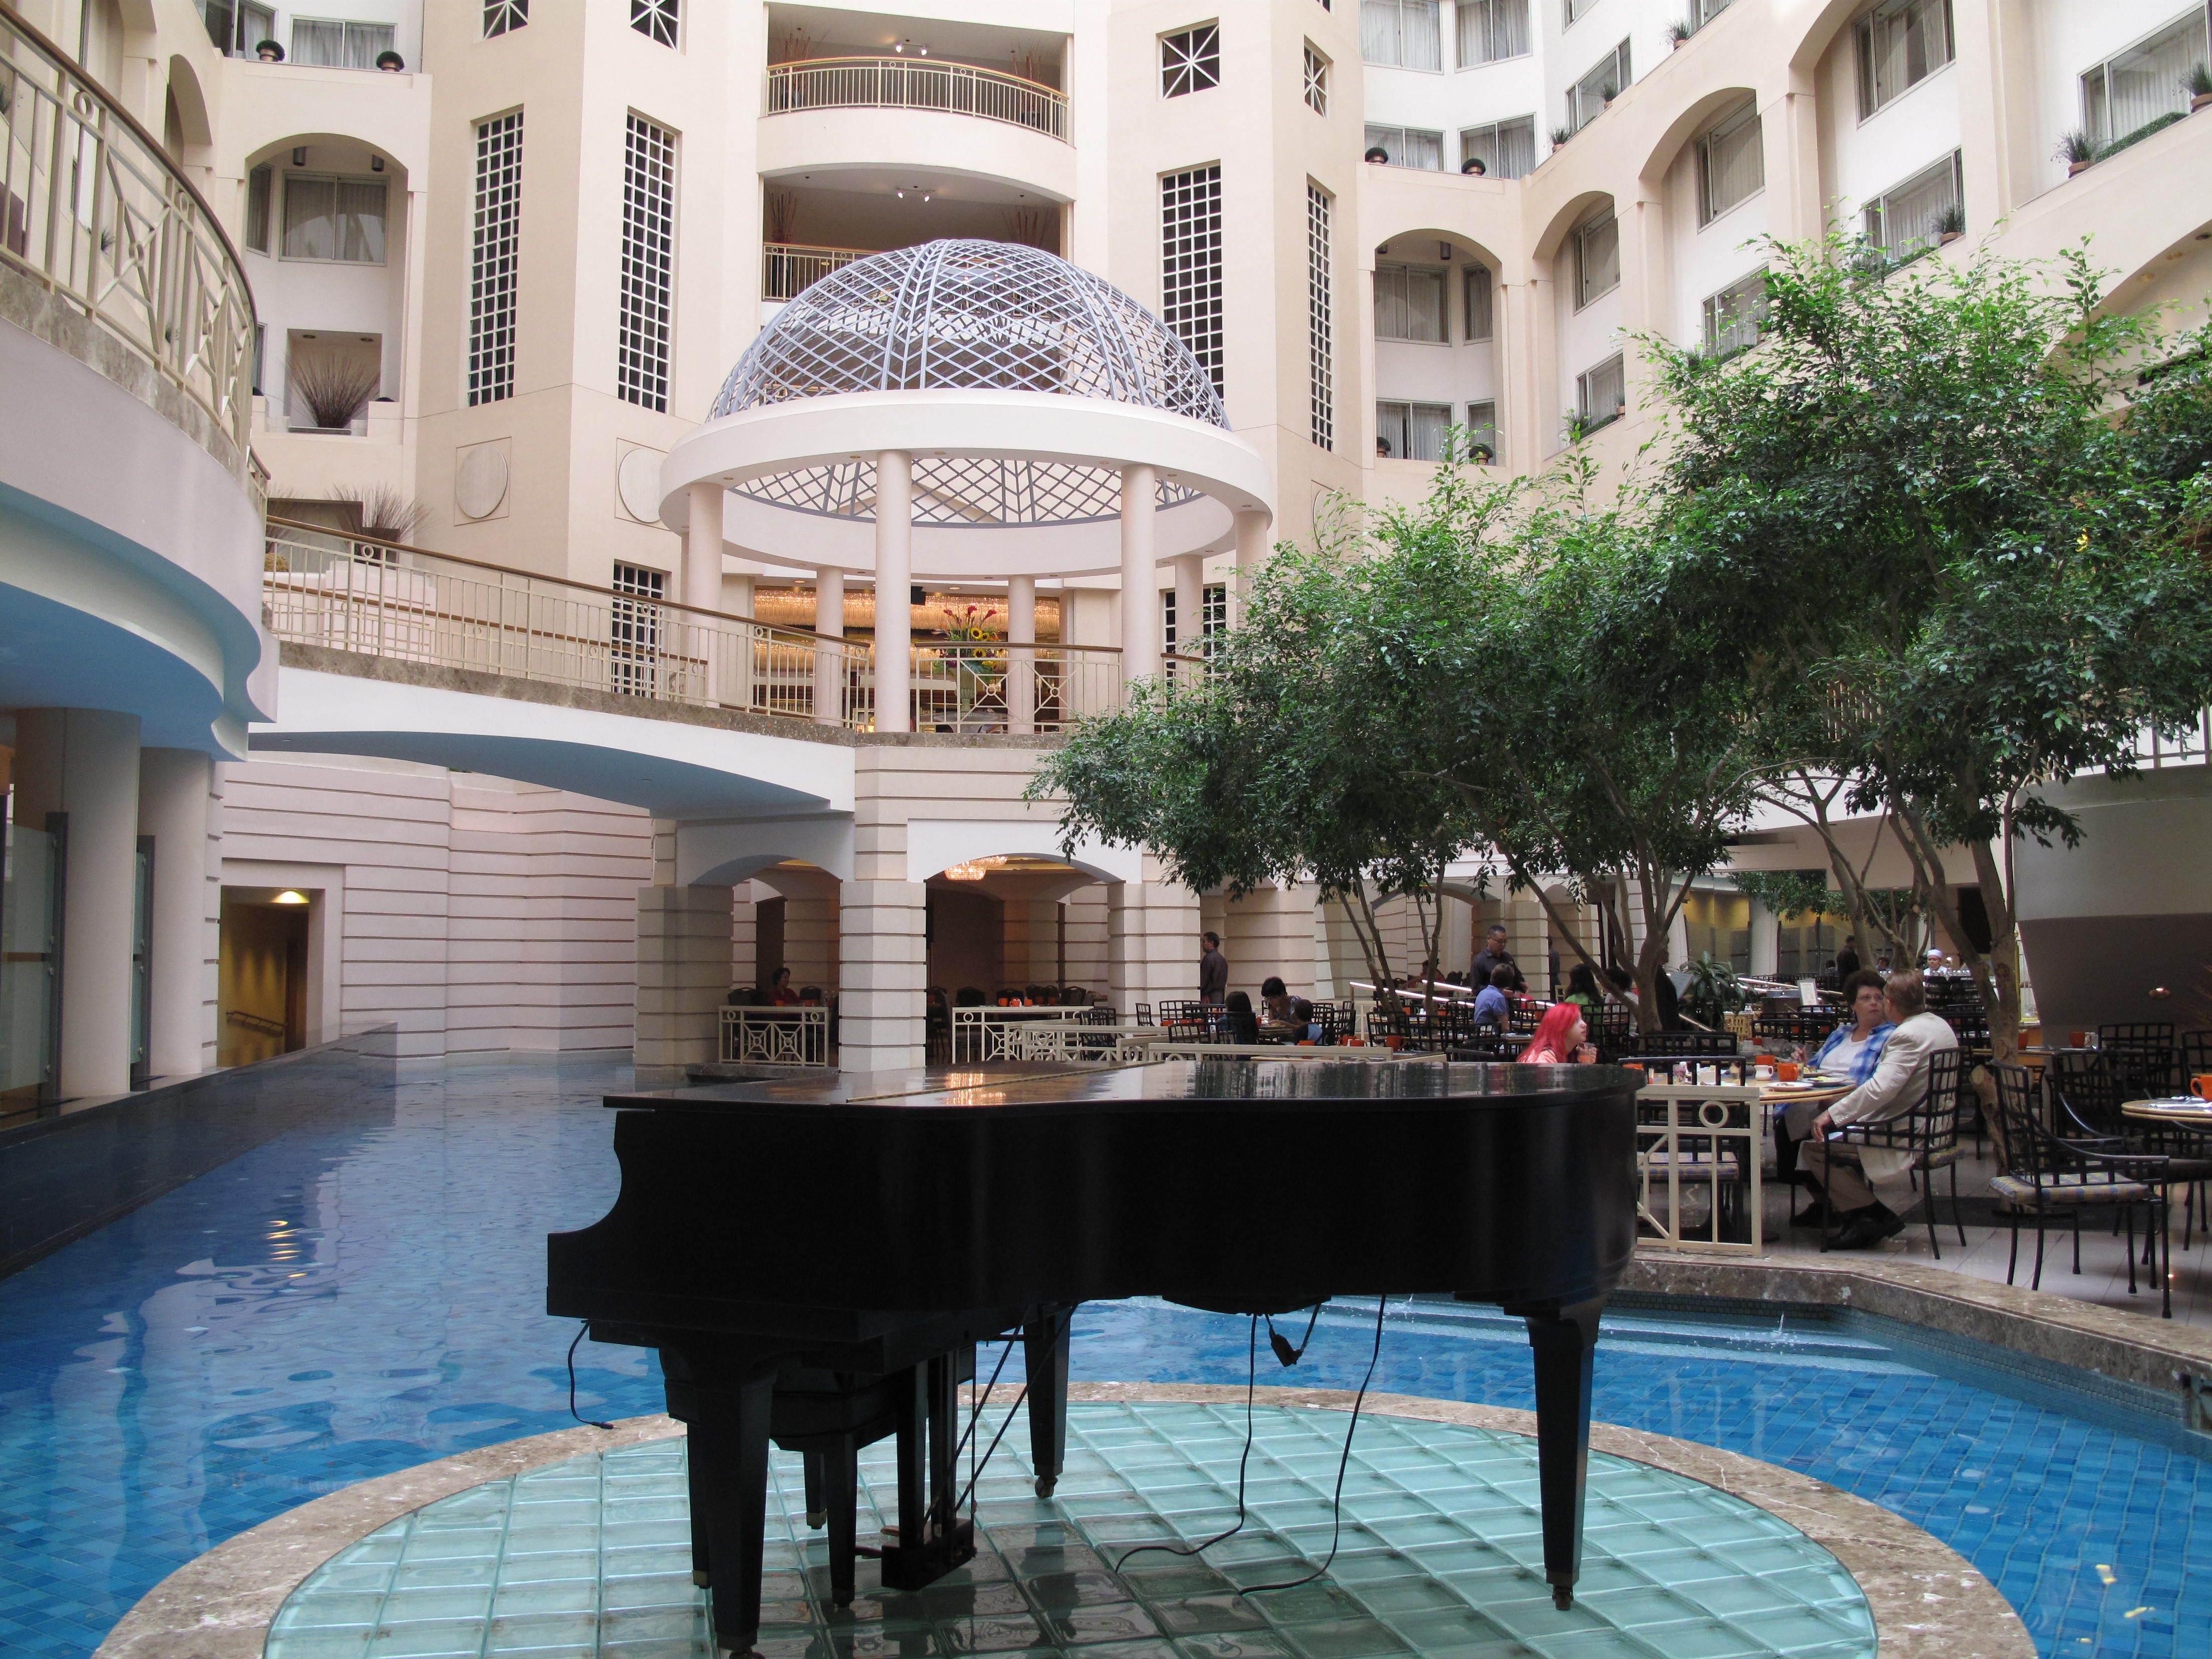 The Grand Hyatt Hotel Washington Dc